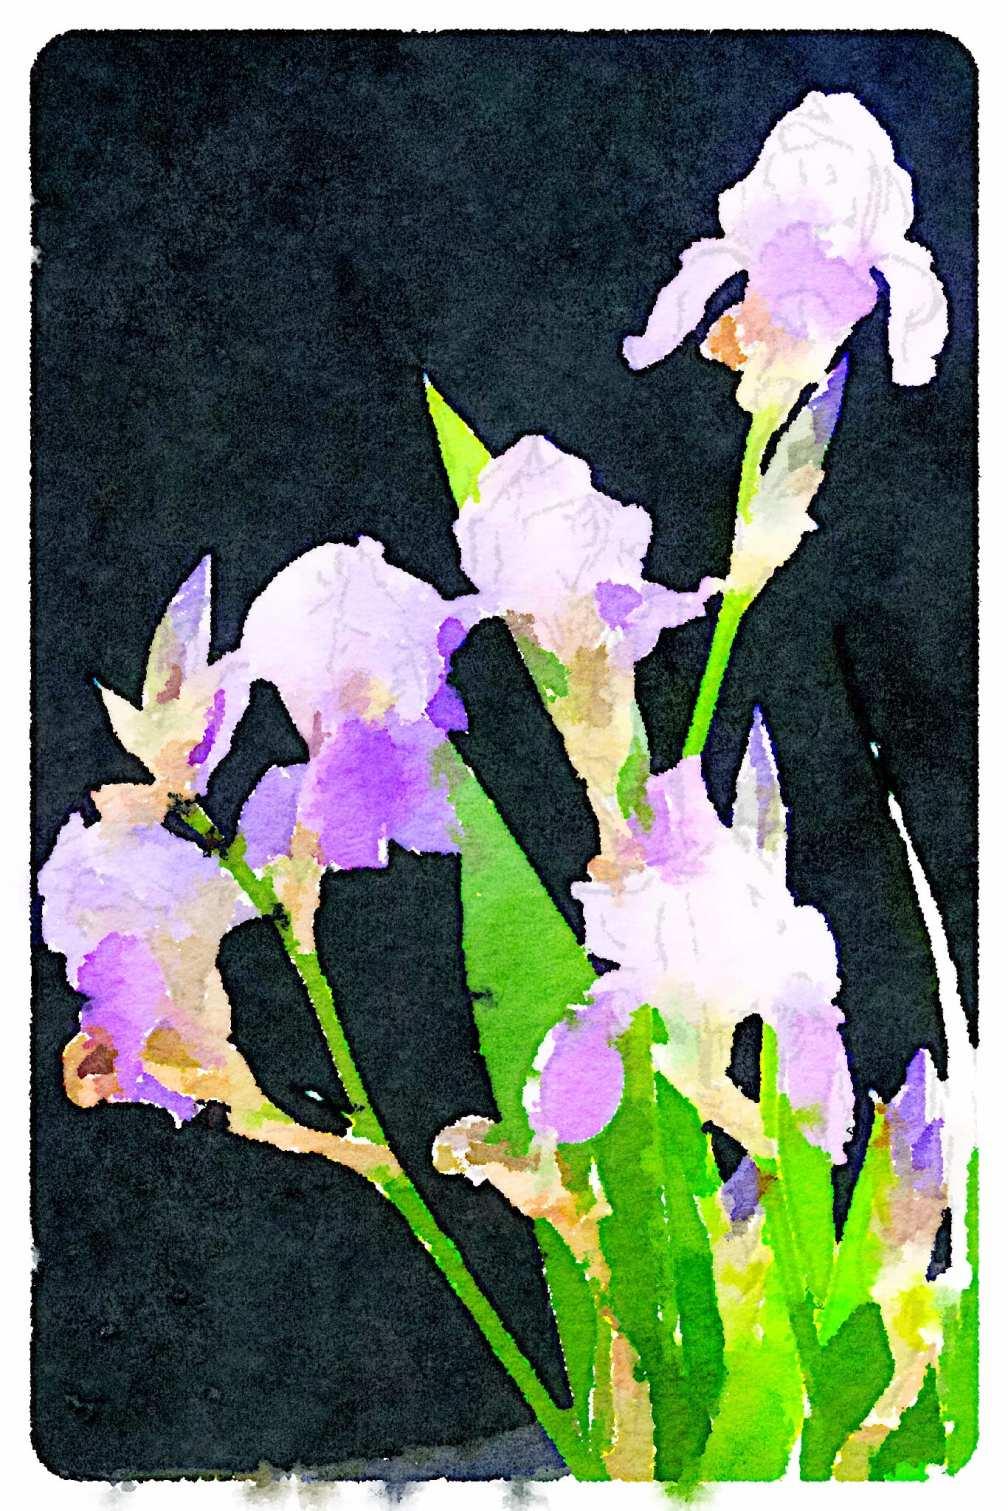 Photo of irises, processed with Waterlogue iPad app.